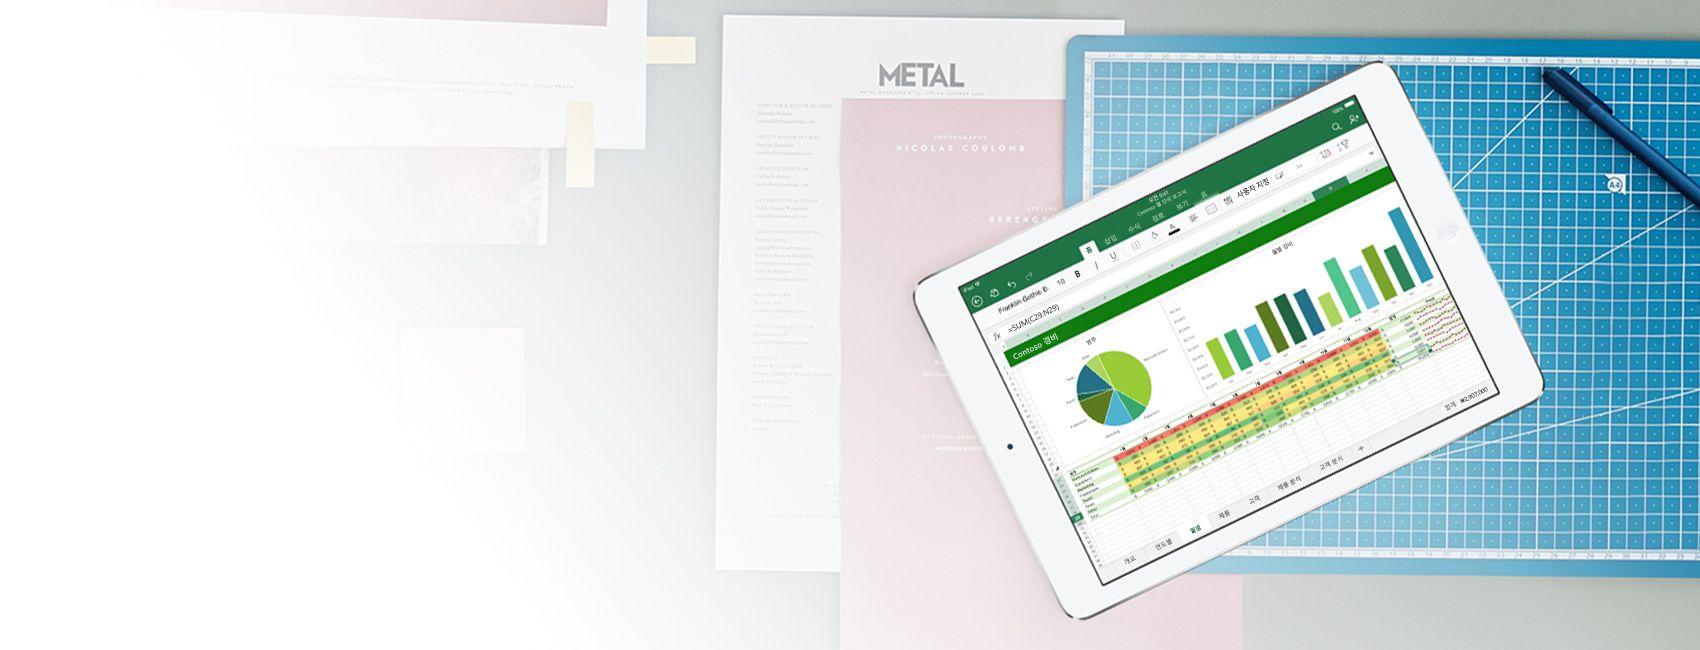 iOS용 Excel 앱에 Excel 스프레드시트와 차트가 표시된 iPad